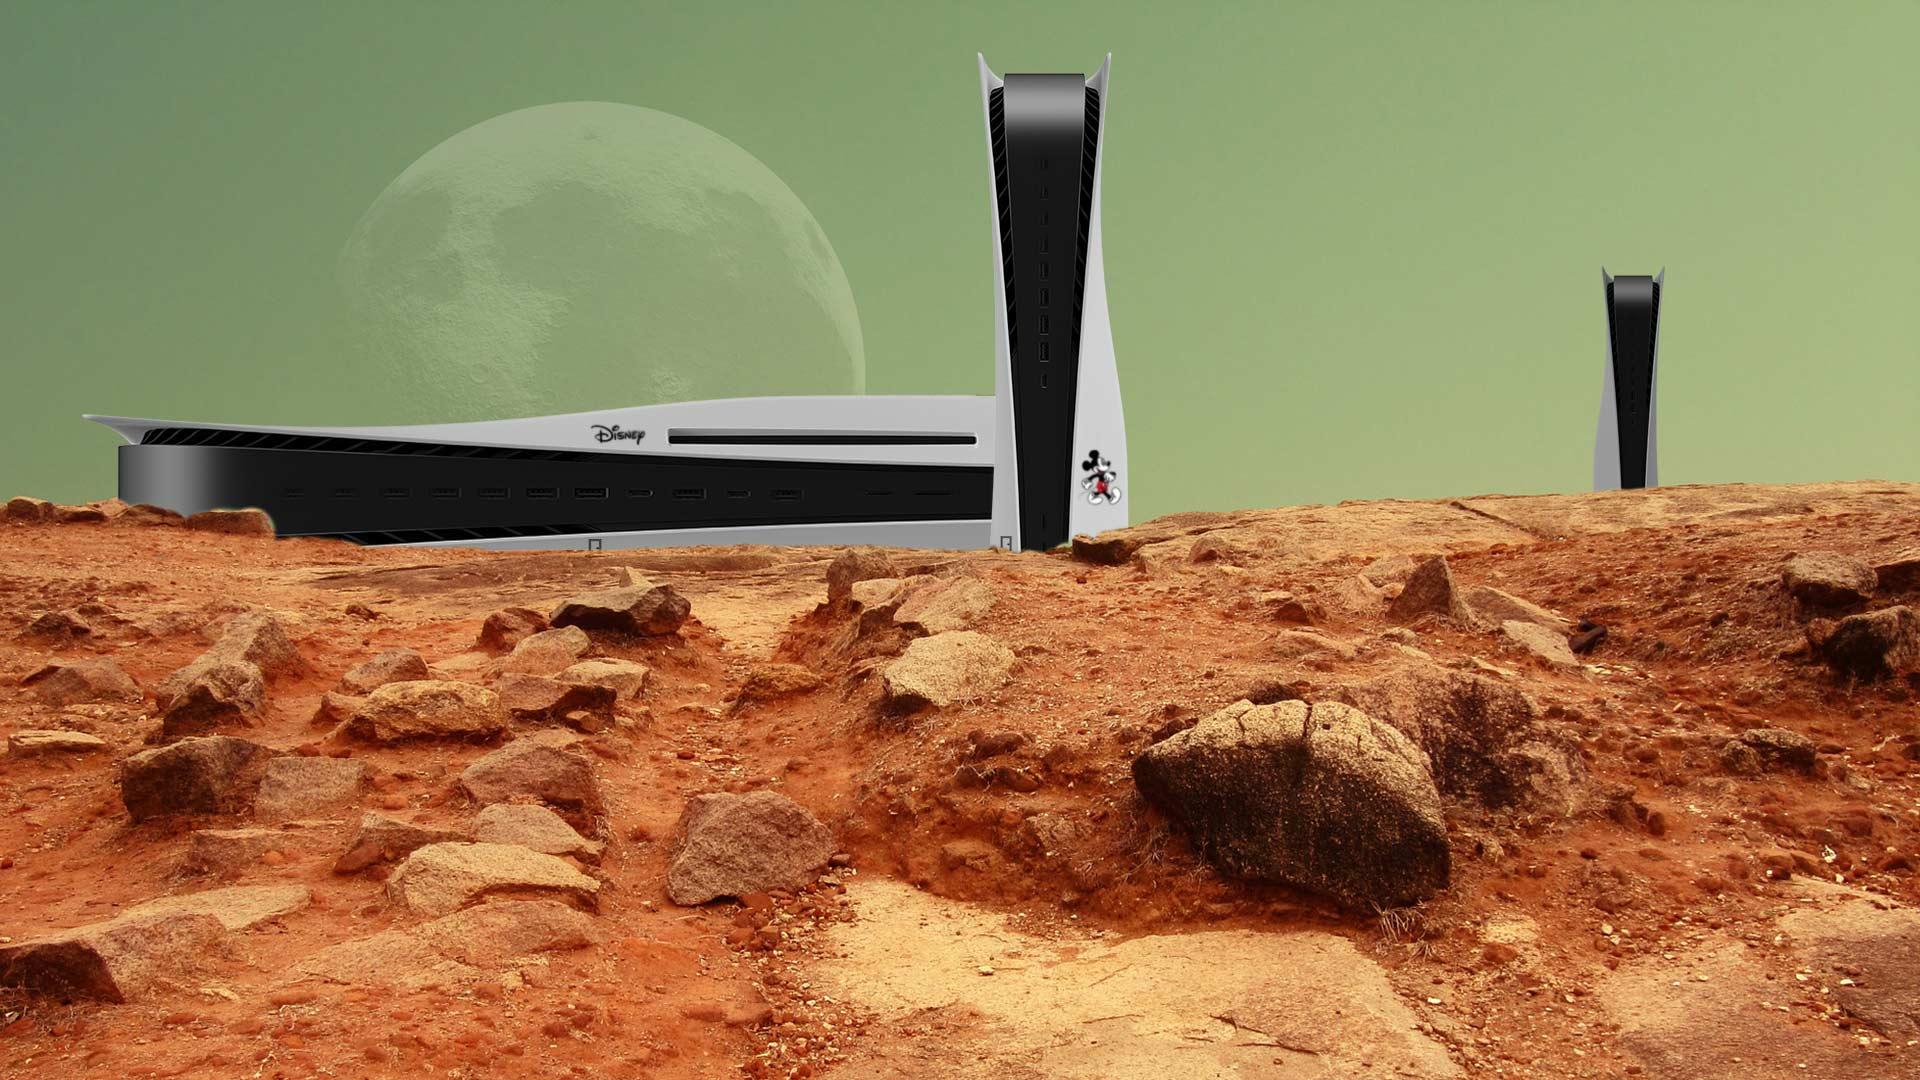 Disney-Raumstation auf dem Mars